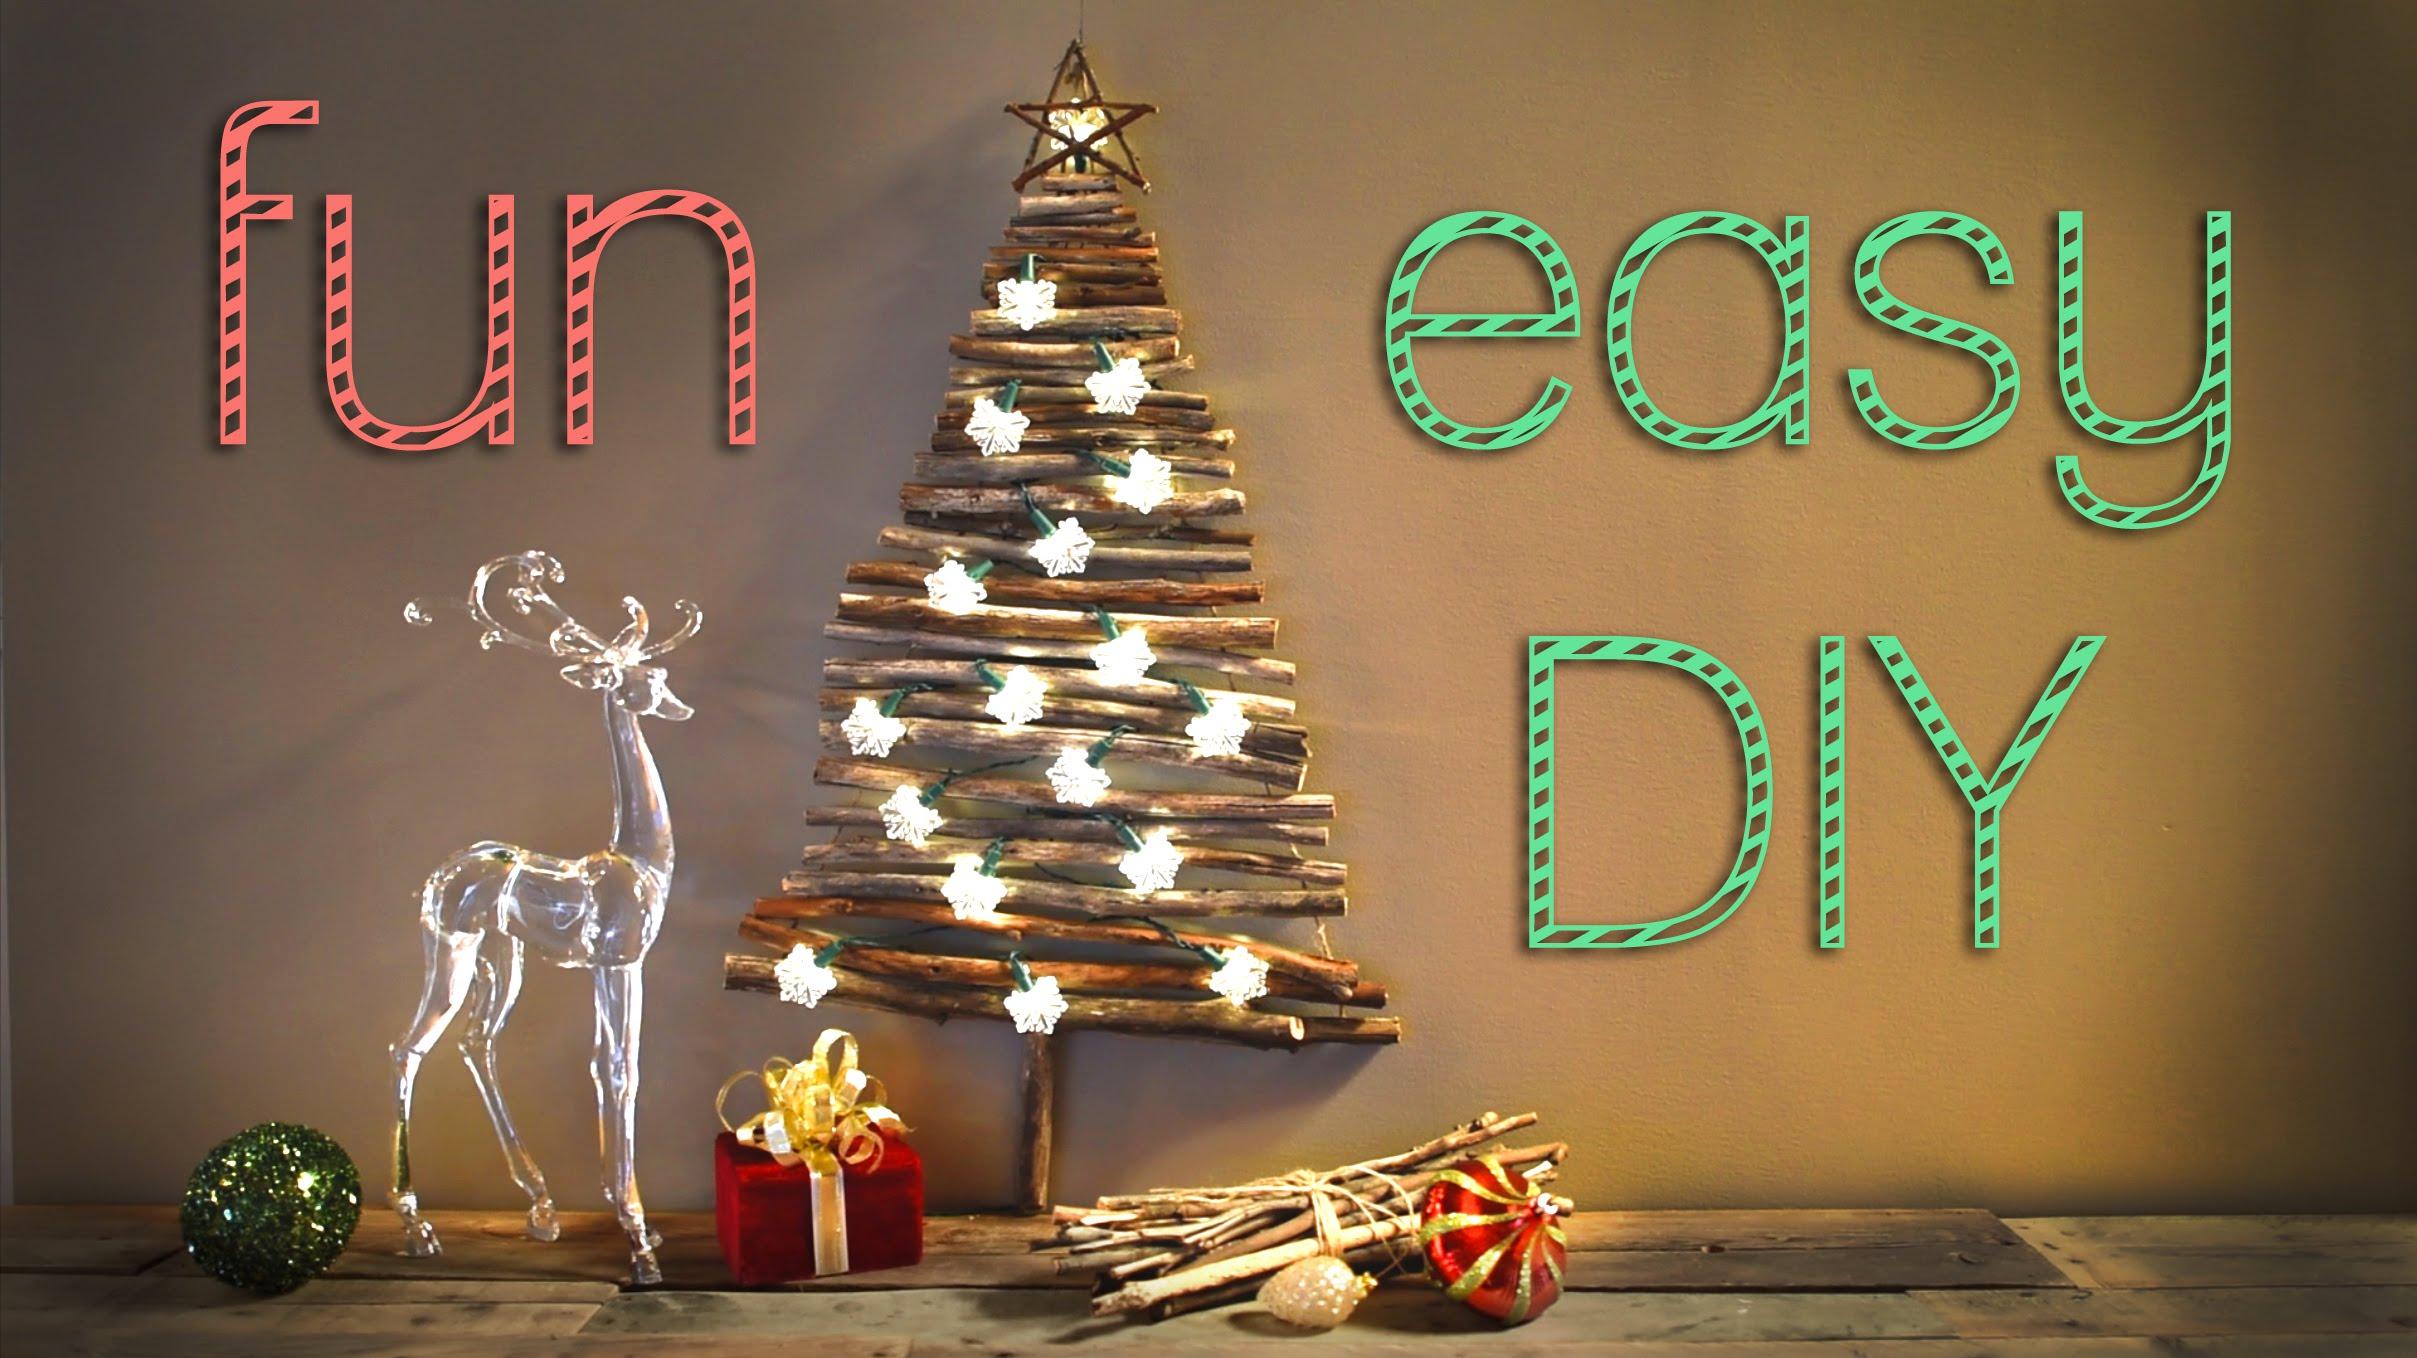 amazing christmas wall decor ideas - Diy Christmas Decorations 2017